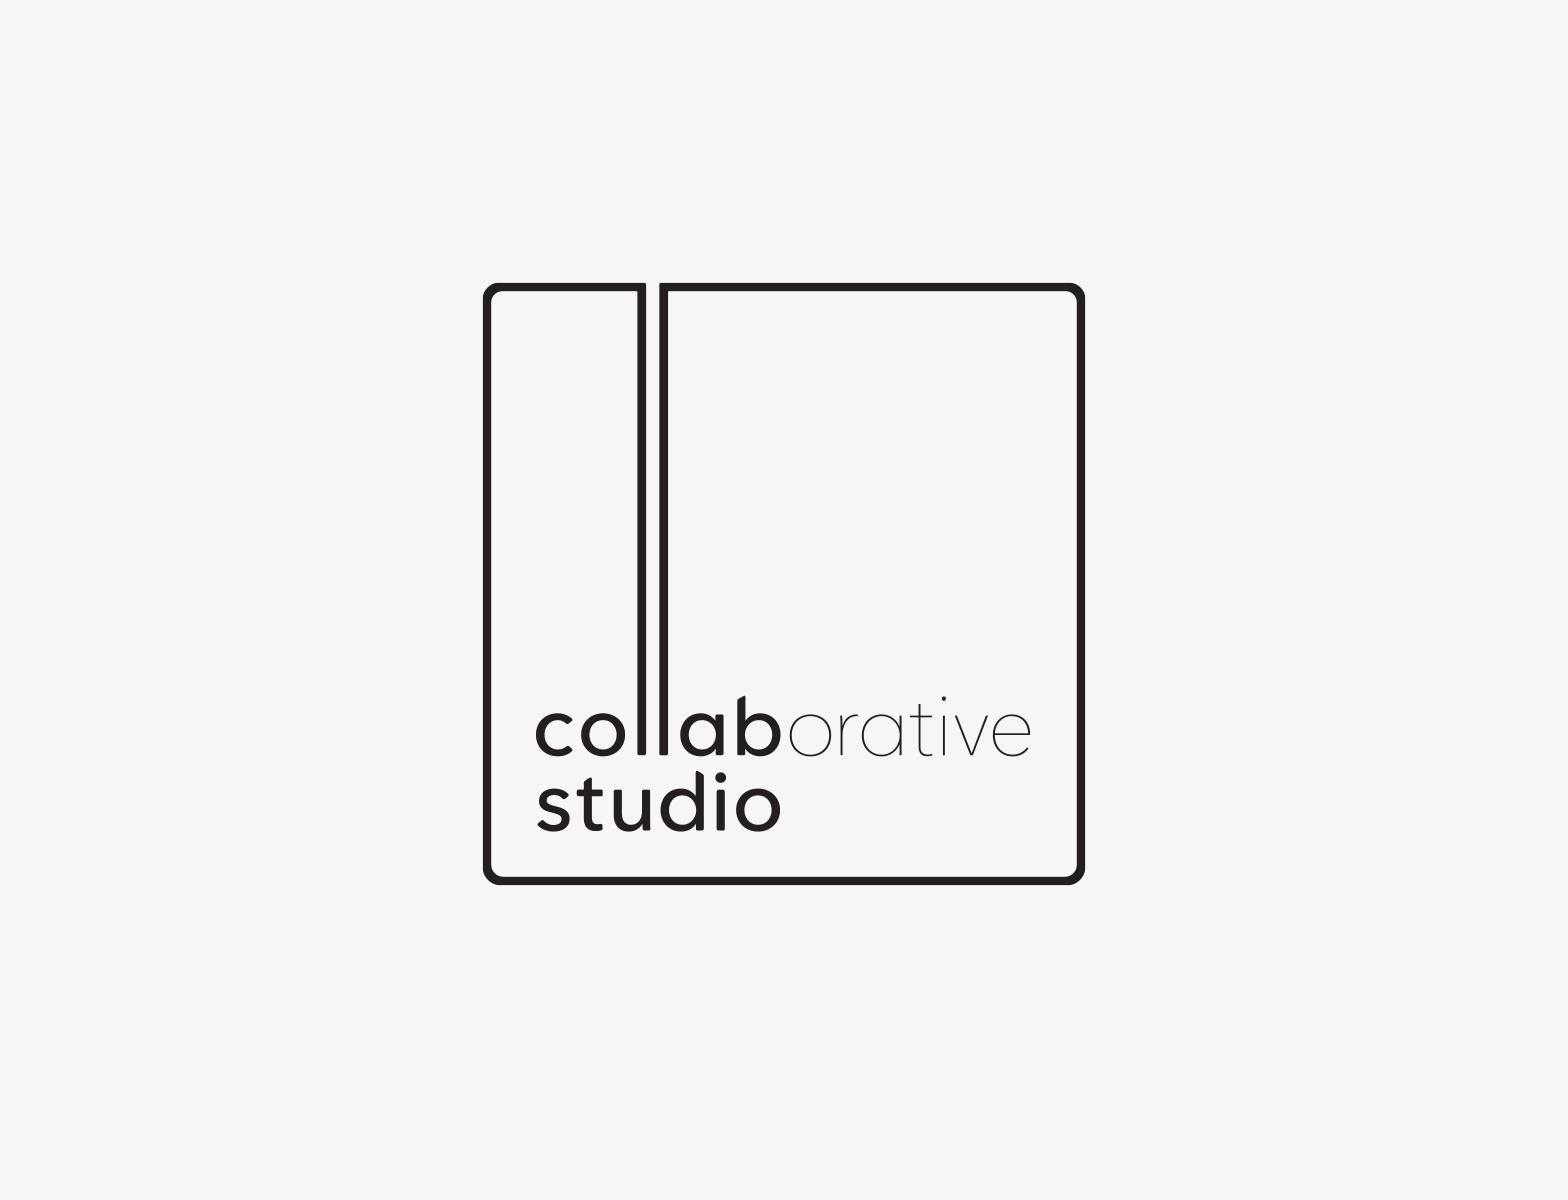 collab-studio-logo-00